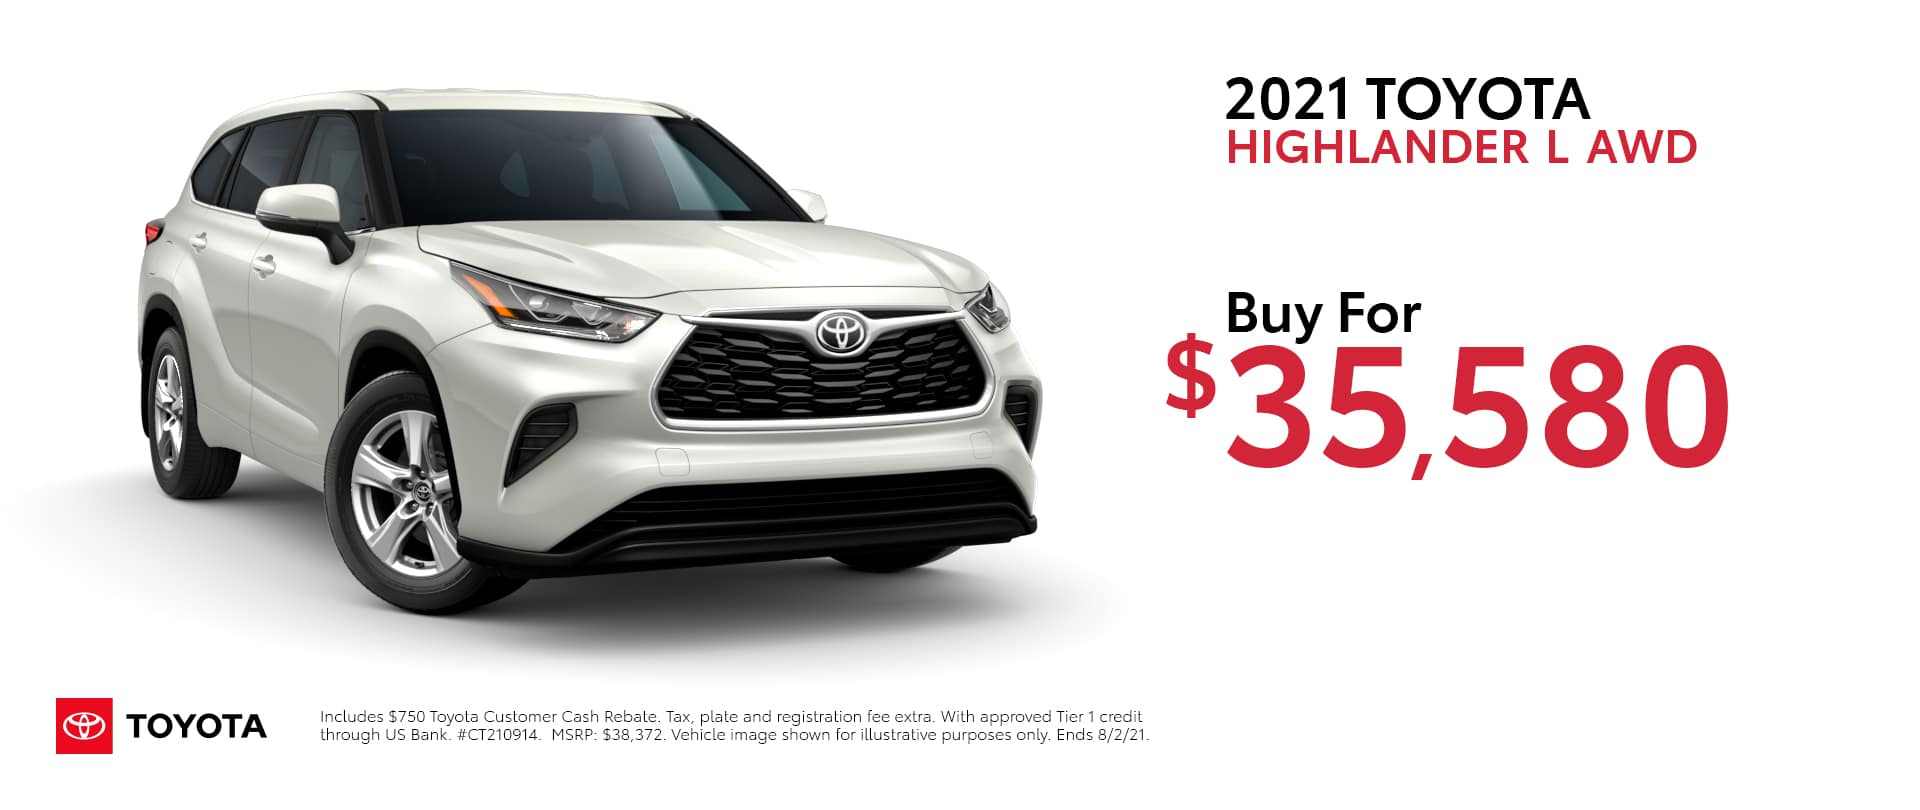 2021-Toyota-Highlander-L-AWD-Buy